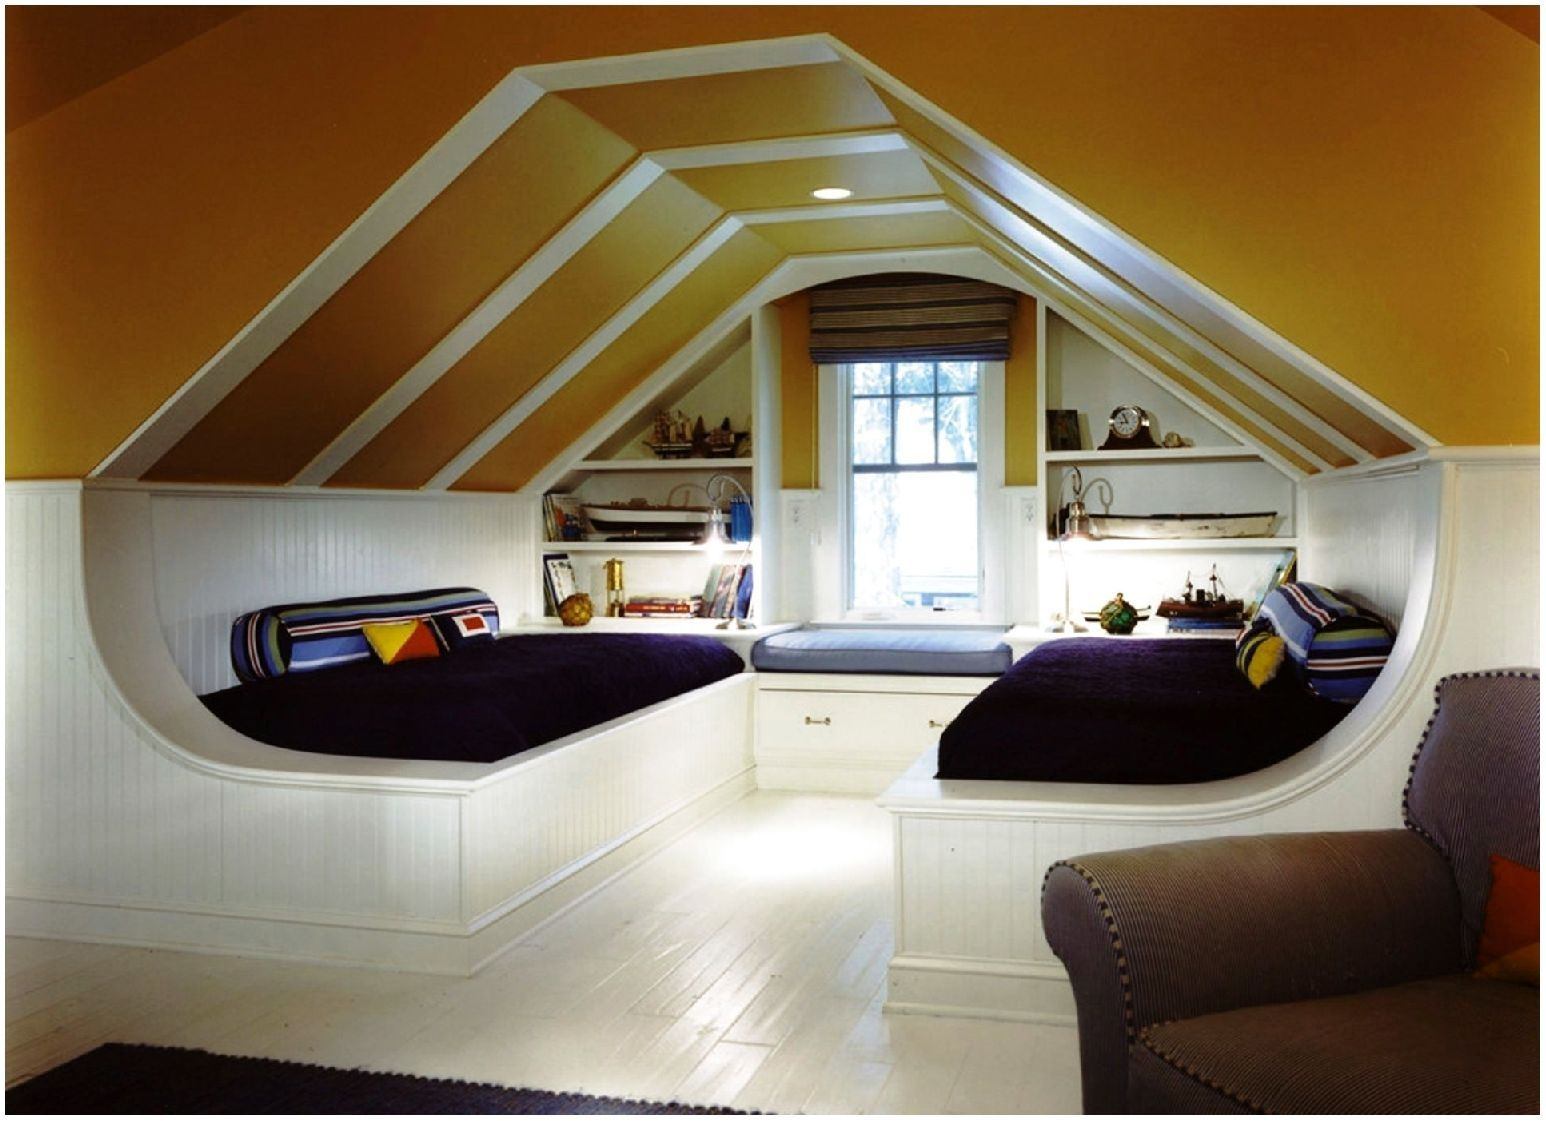 Brilliant Photo Of Modern Attic Bedroom Designs Attic Rooms Attic Design Attic Renovation